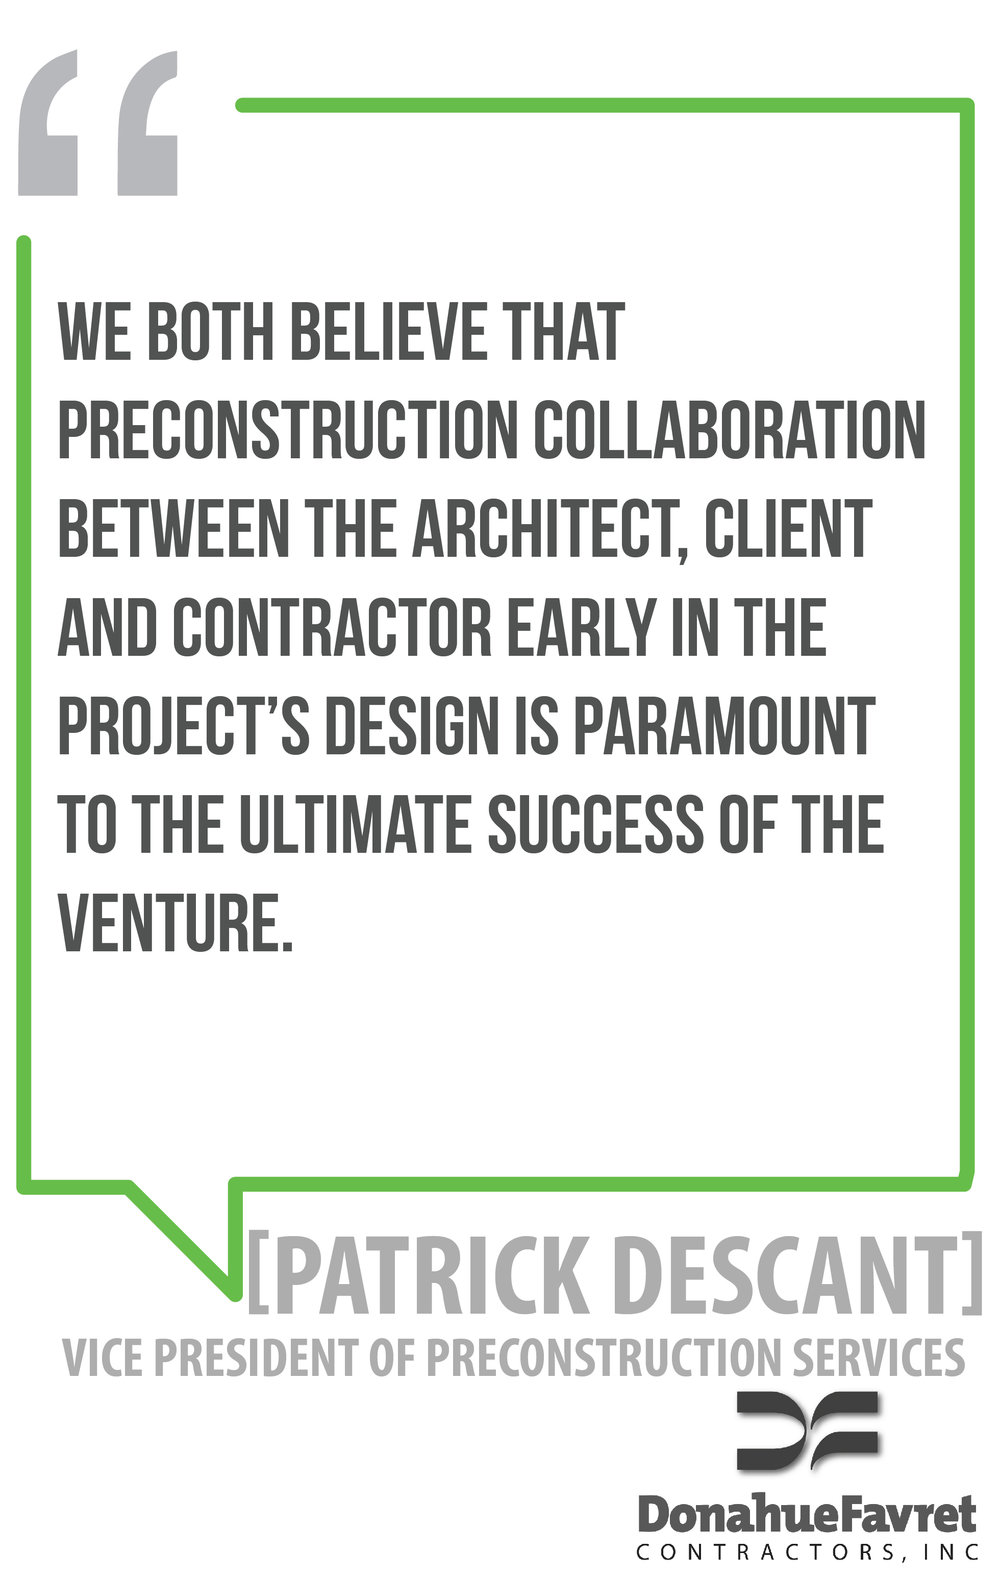 Greenleaf_Lawson_Architects-Testimonials-DESCANT-01.jpg